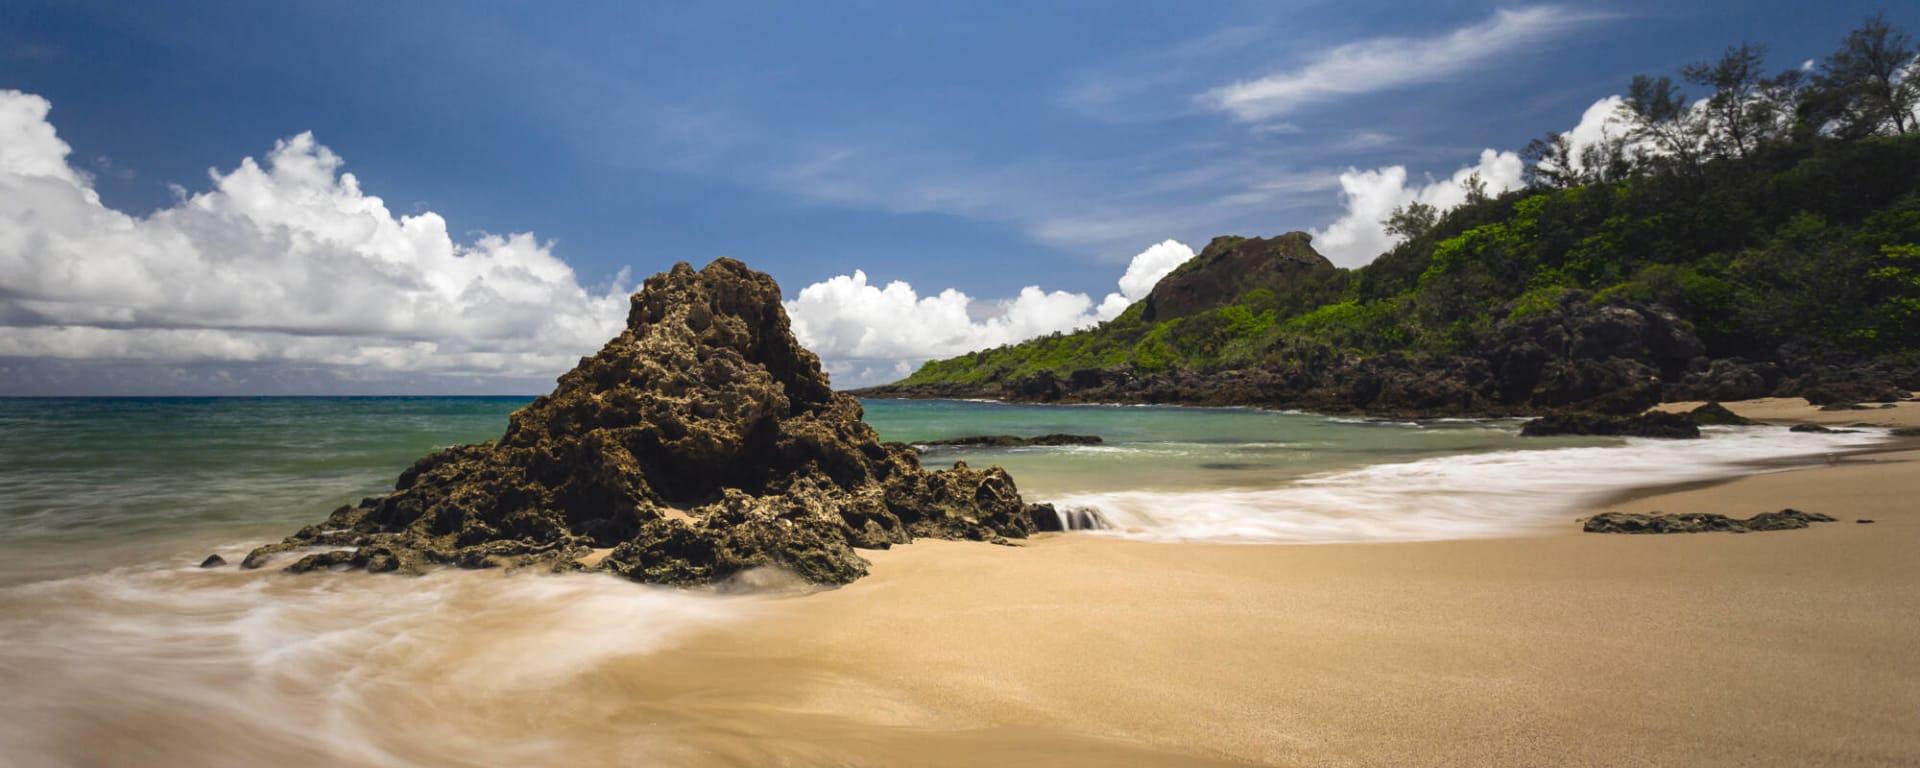 Taiwan entdecken mit Tischler Reisen: Taiwan Kenting Strand